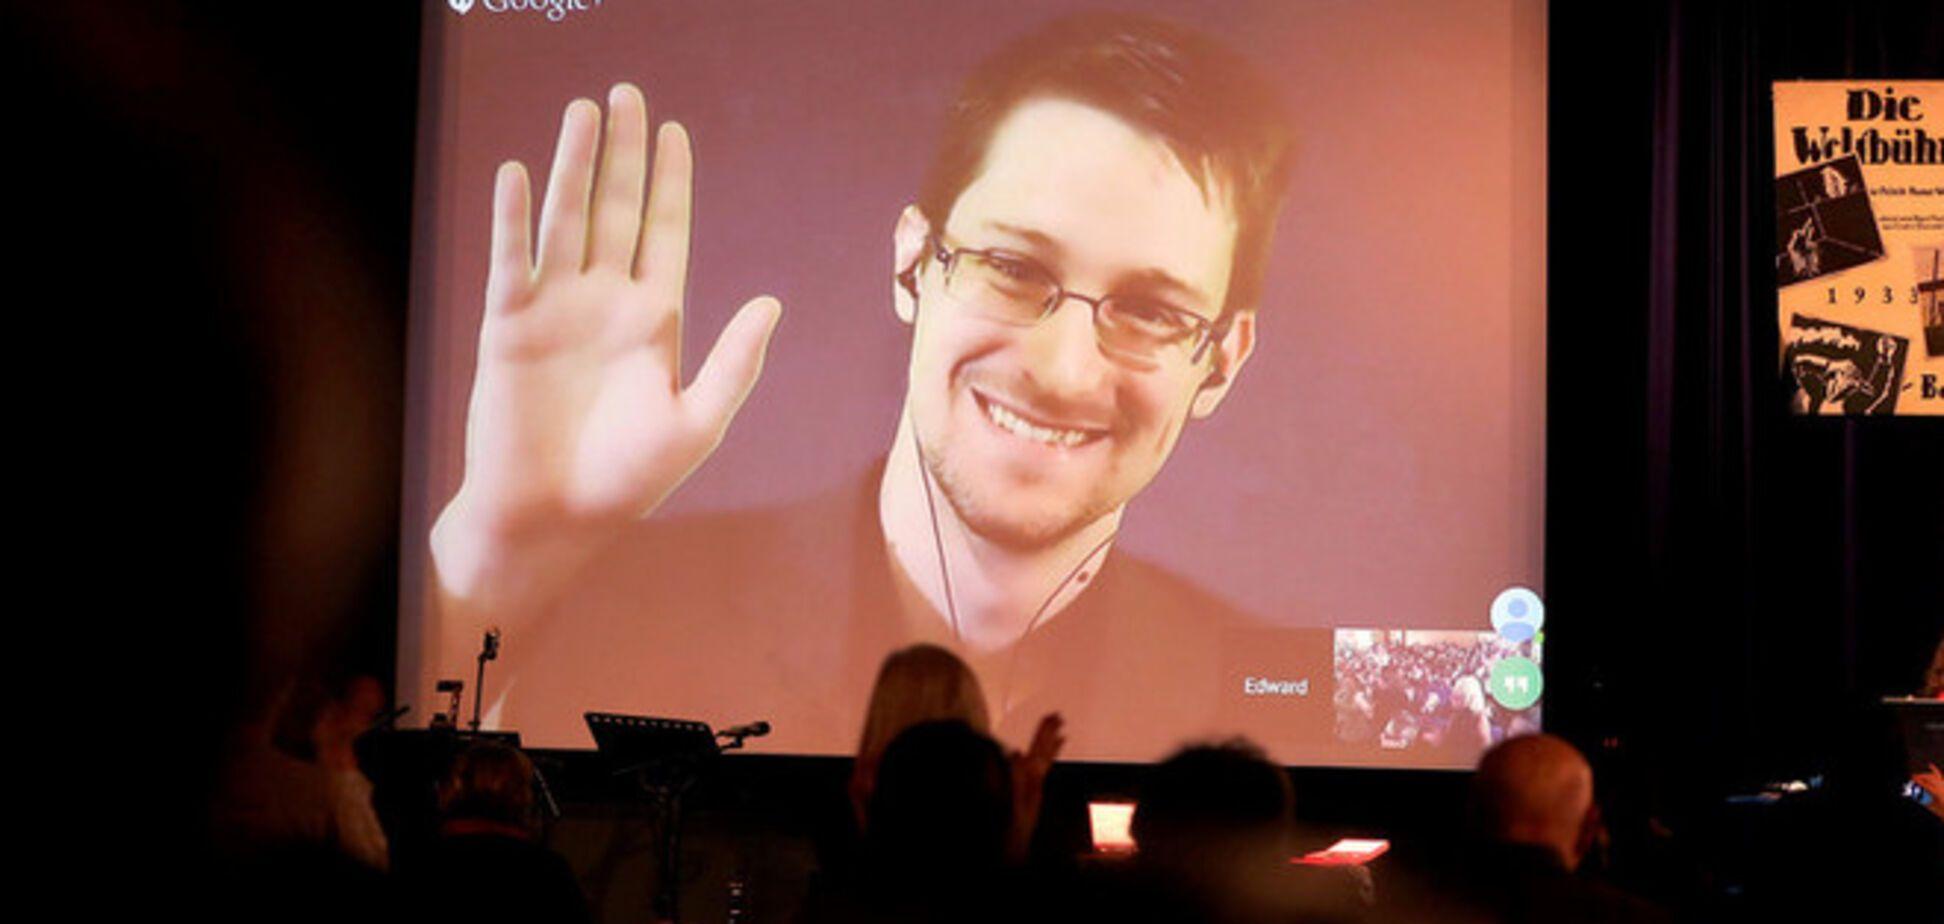 Журналист NY Times скончался после интервью со Сноуденом